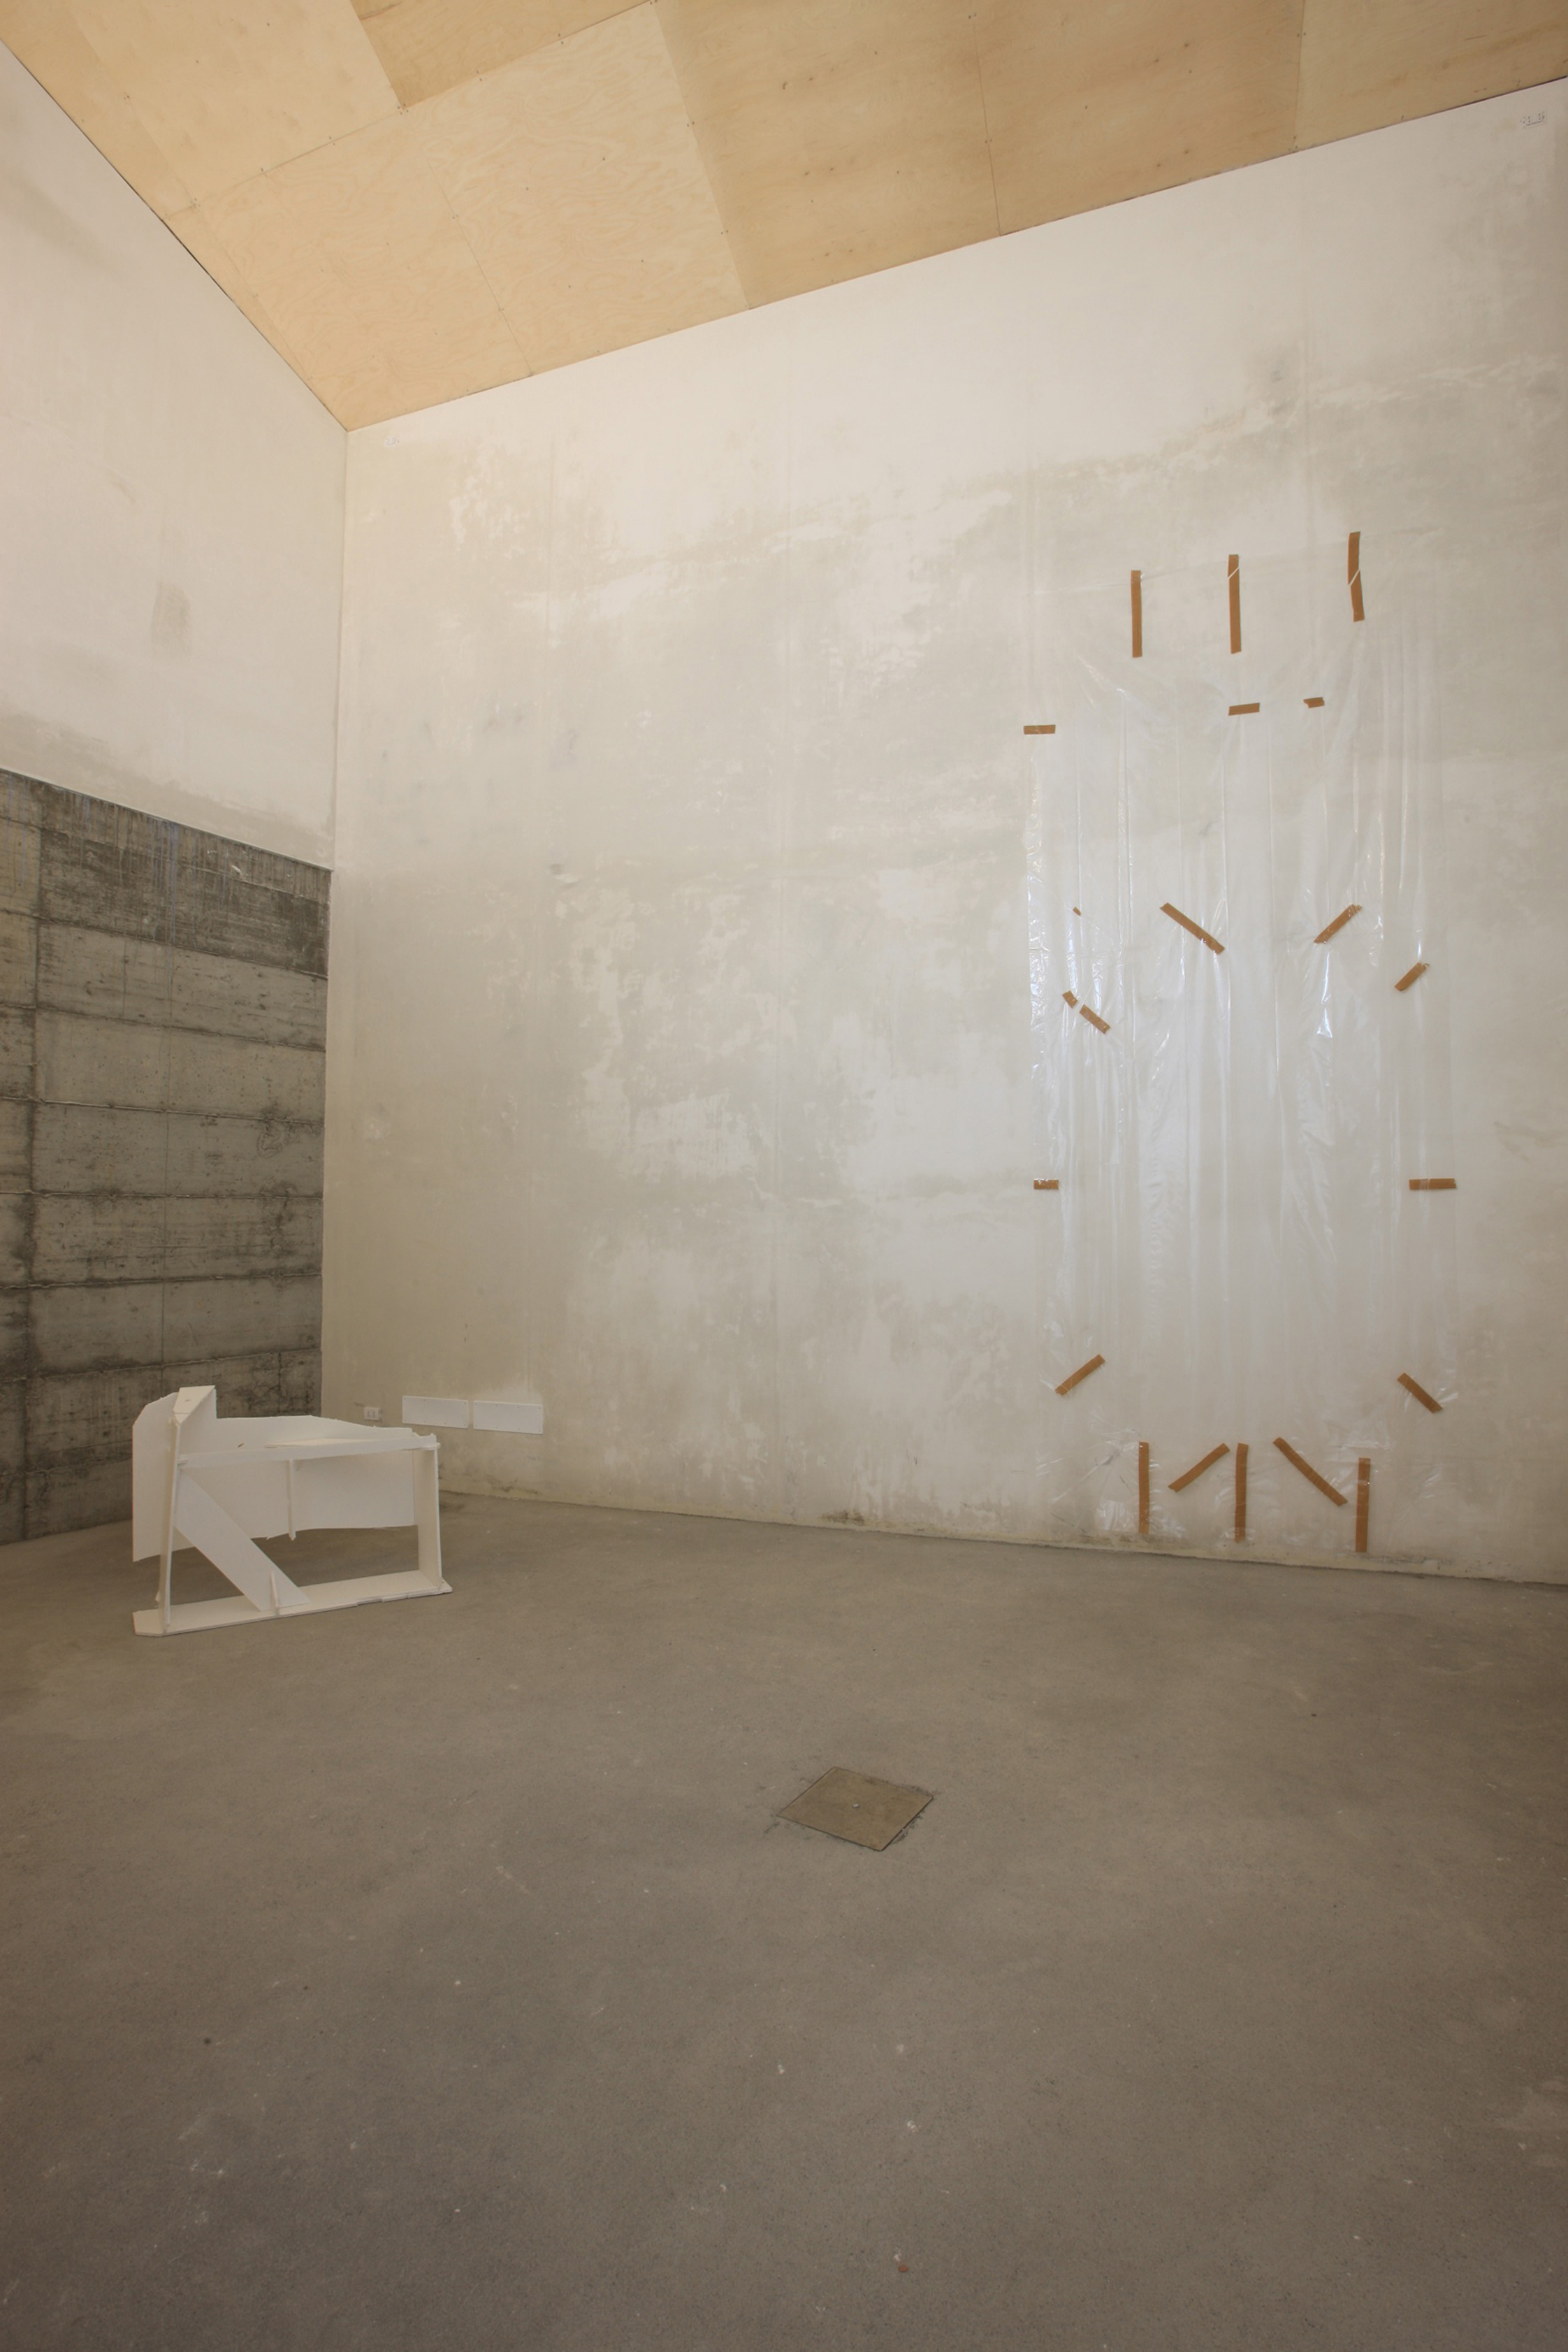 installation view, Gedi Sibony, ZERO..., Milano, 2008 Foto: Agostino Osio Courtesy of the artist and ZERO..., Milano